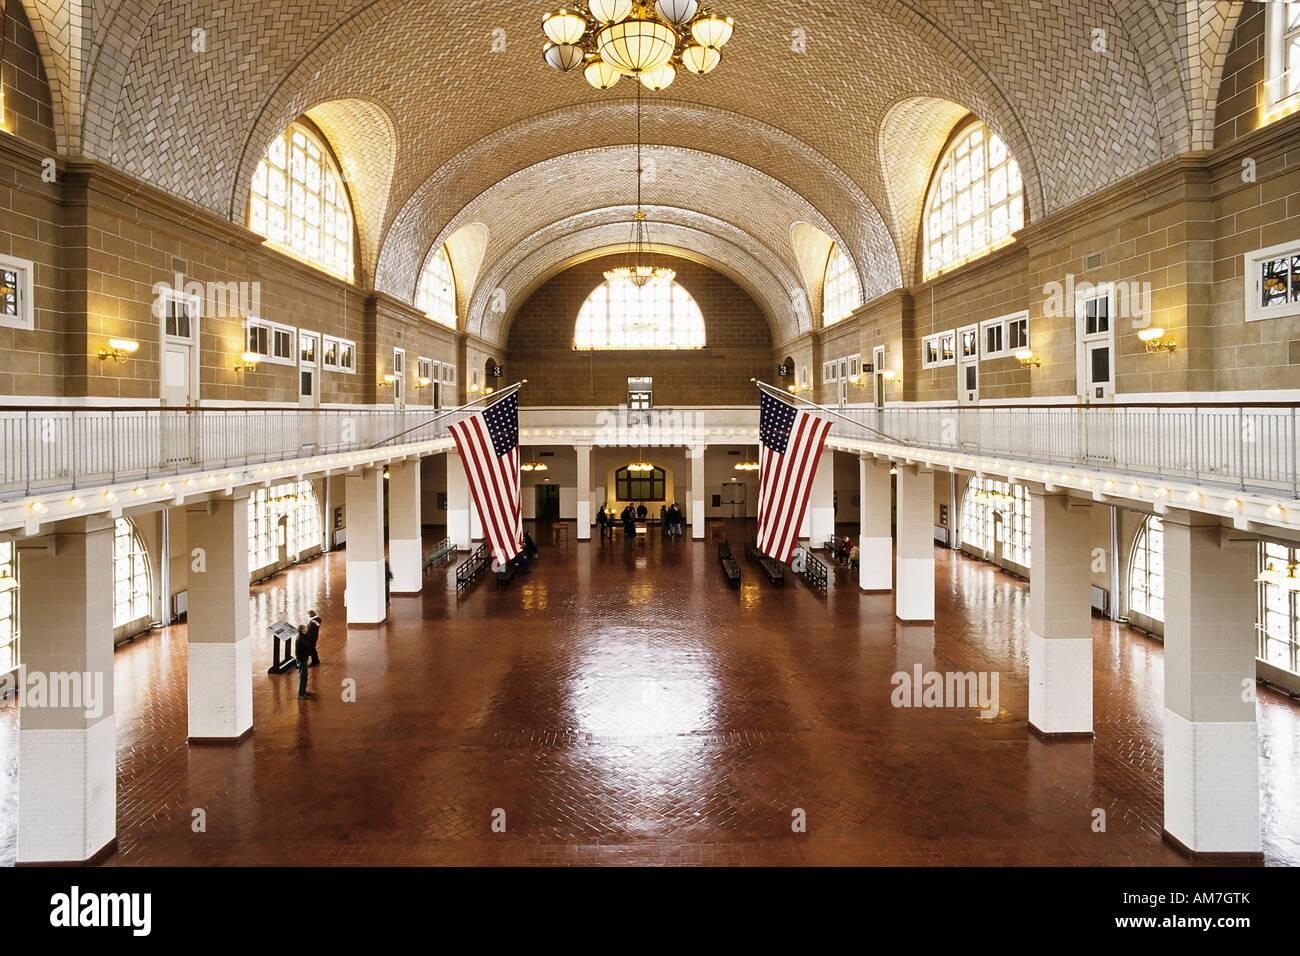 Ellis Island, main building, registration hall, History, New York City, USA - Stock Image